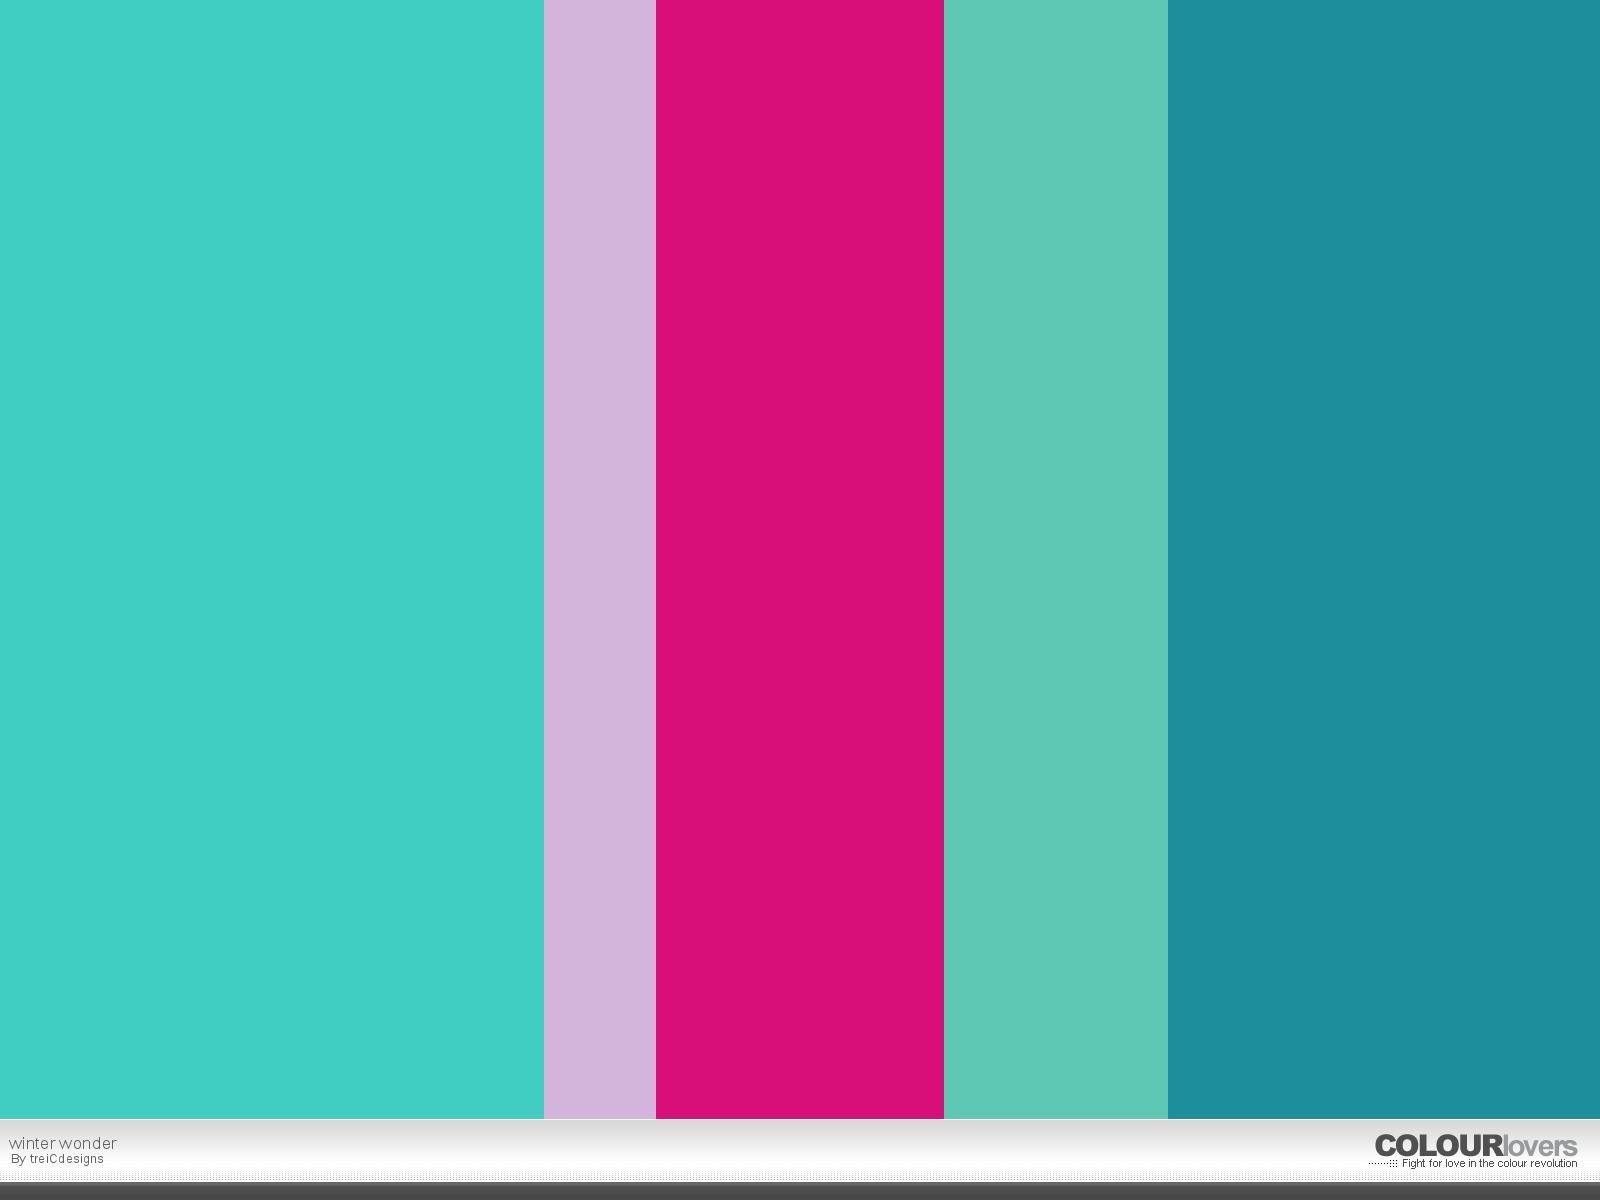 artJOURNALING daily: WINTER WONDER background & color palette {FREE ...